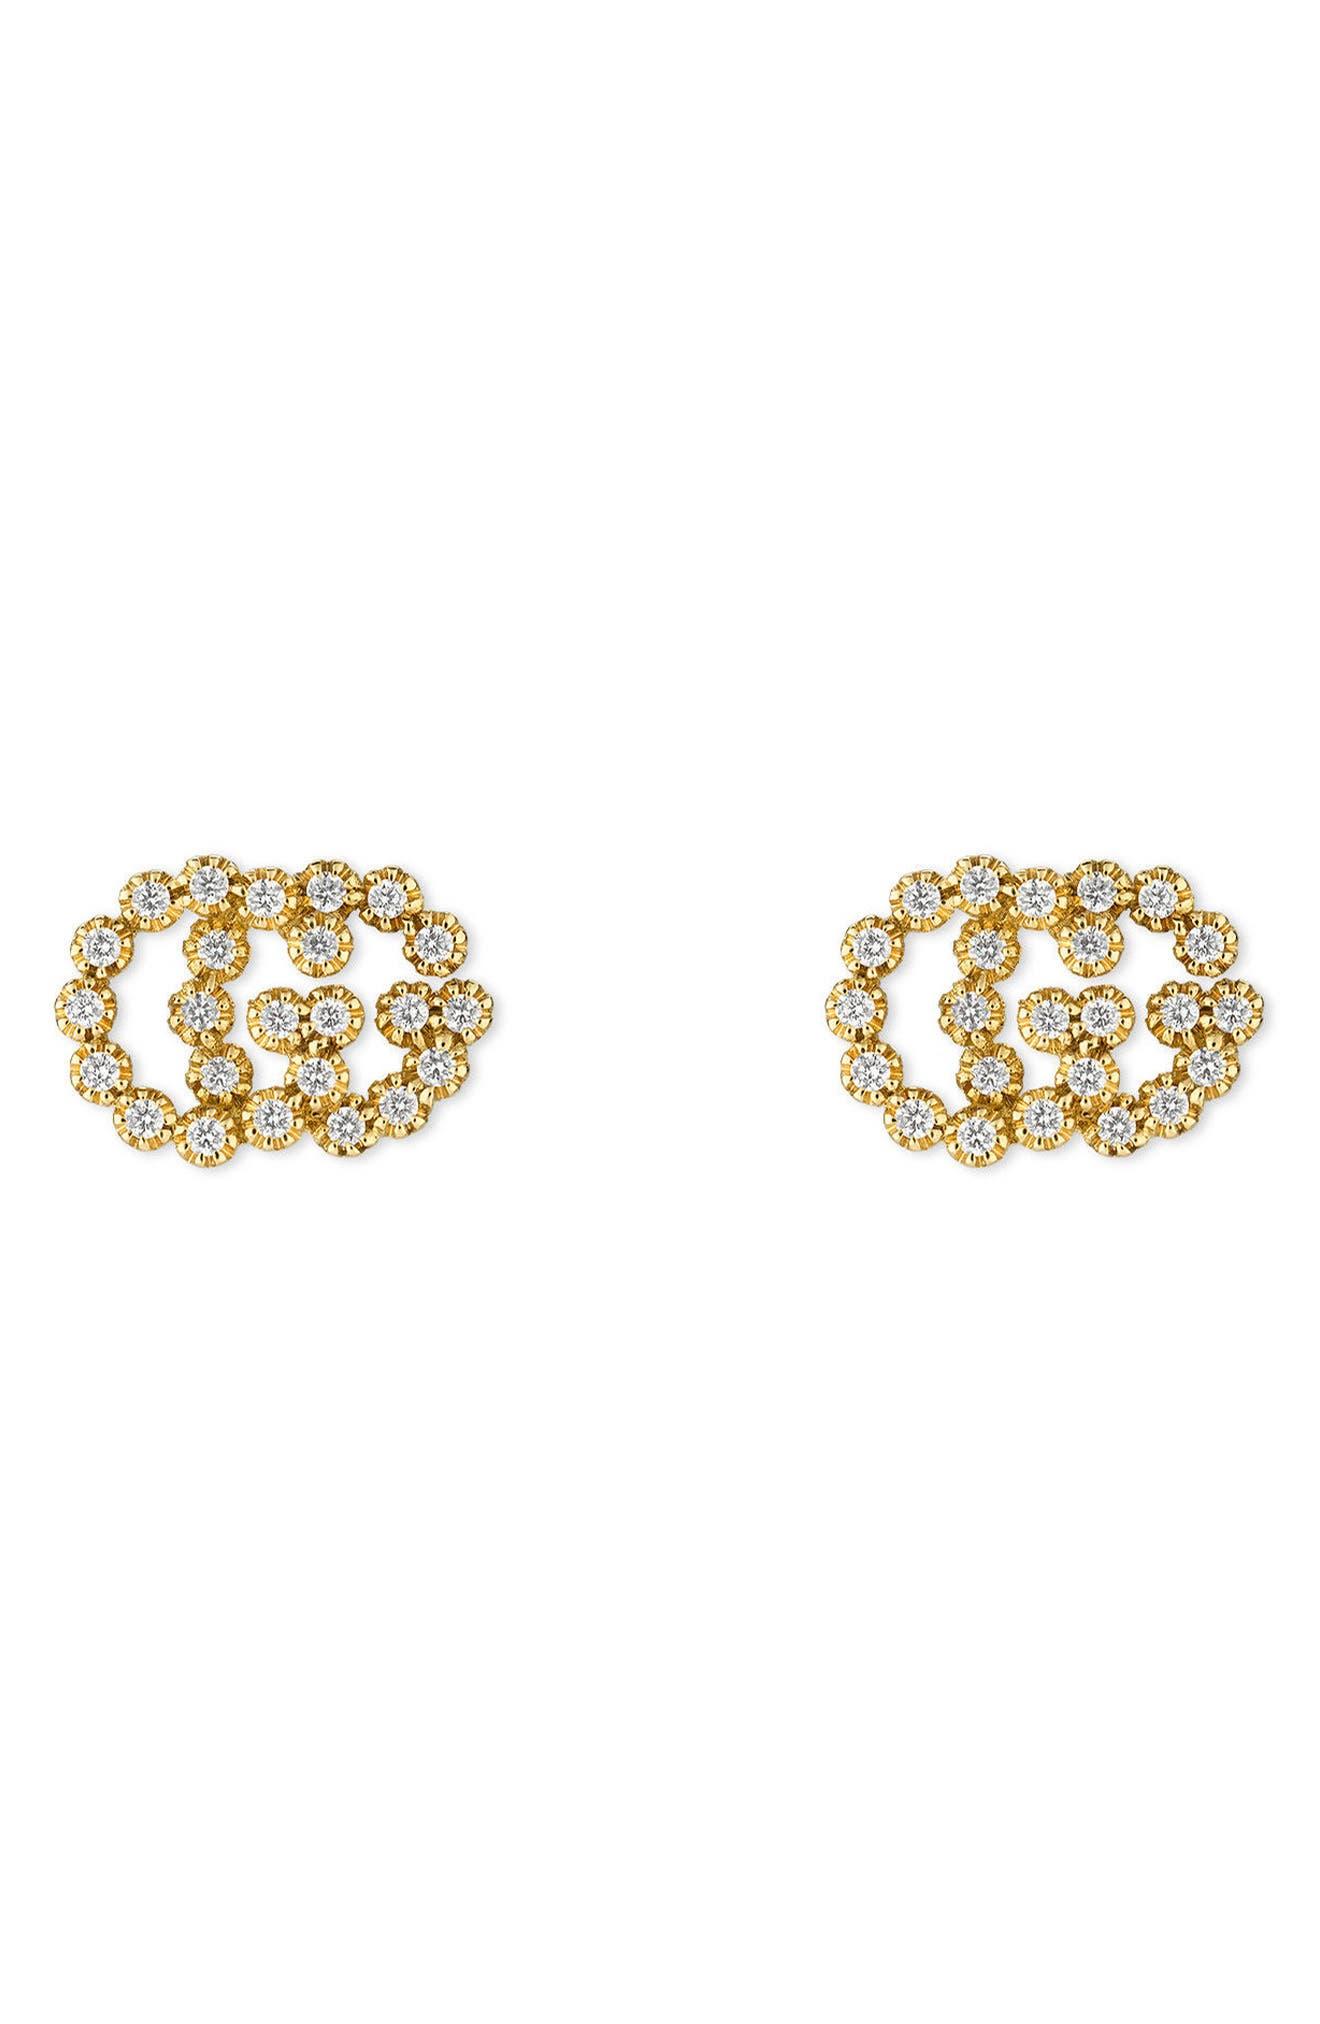 7bb13e78d8a50 GUCCI 18K YELLOW GOLD RUNNING G DIAMOND STUD EARRINGS